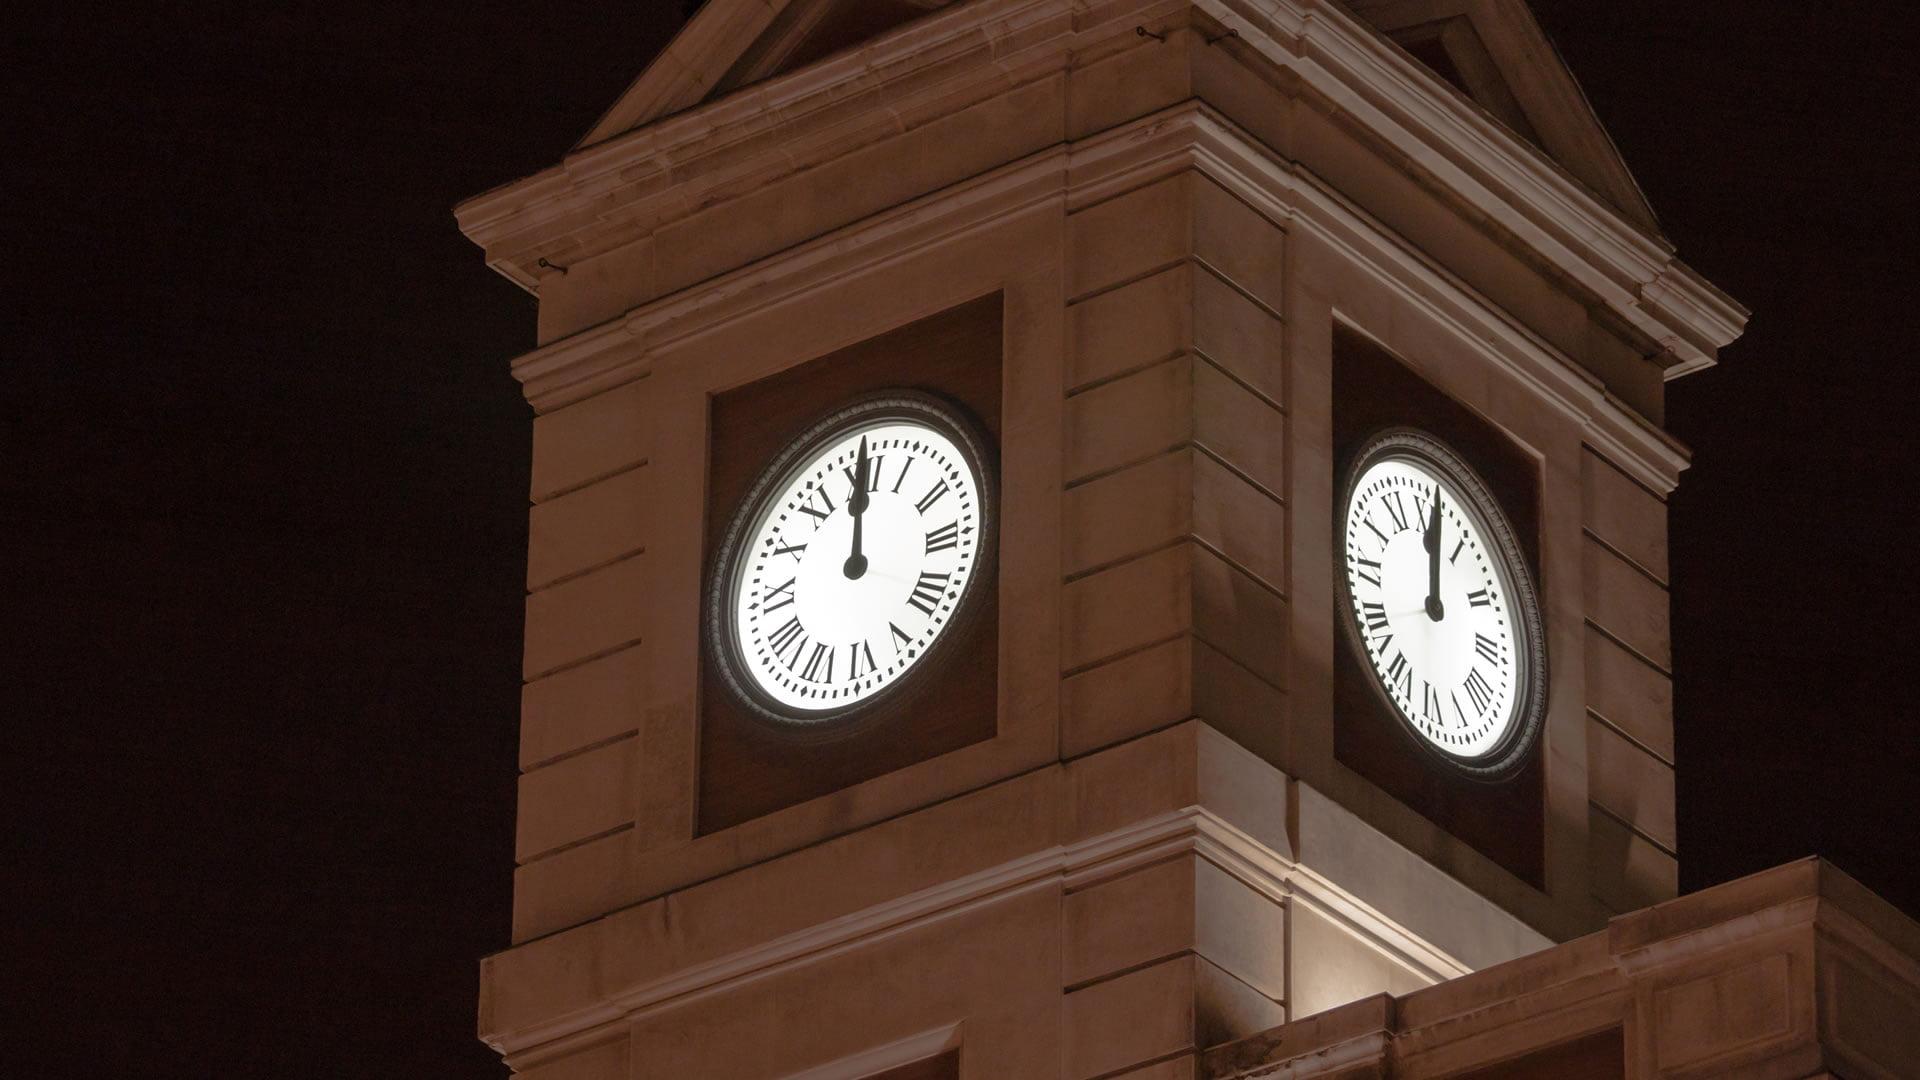 Reloj de la puerta del sol madrid for Puerta del sol en nochevieja